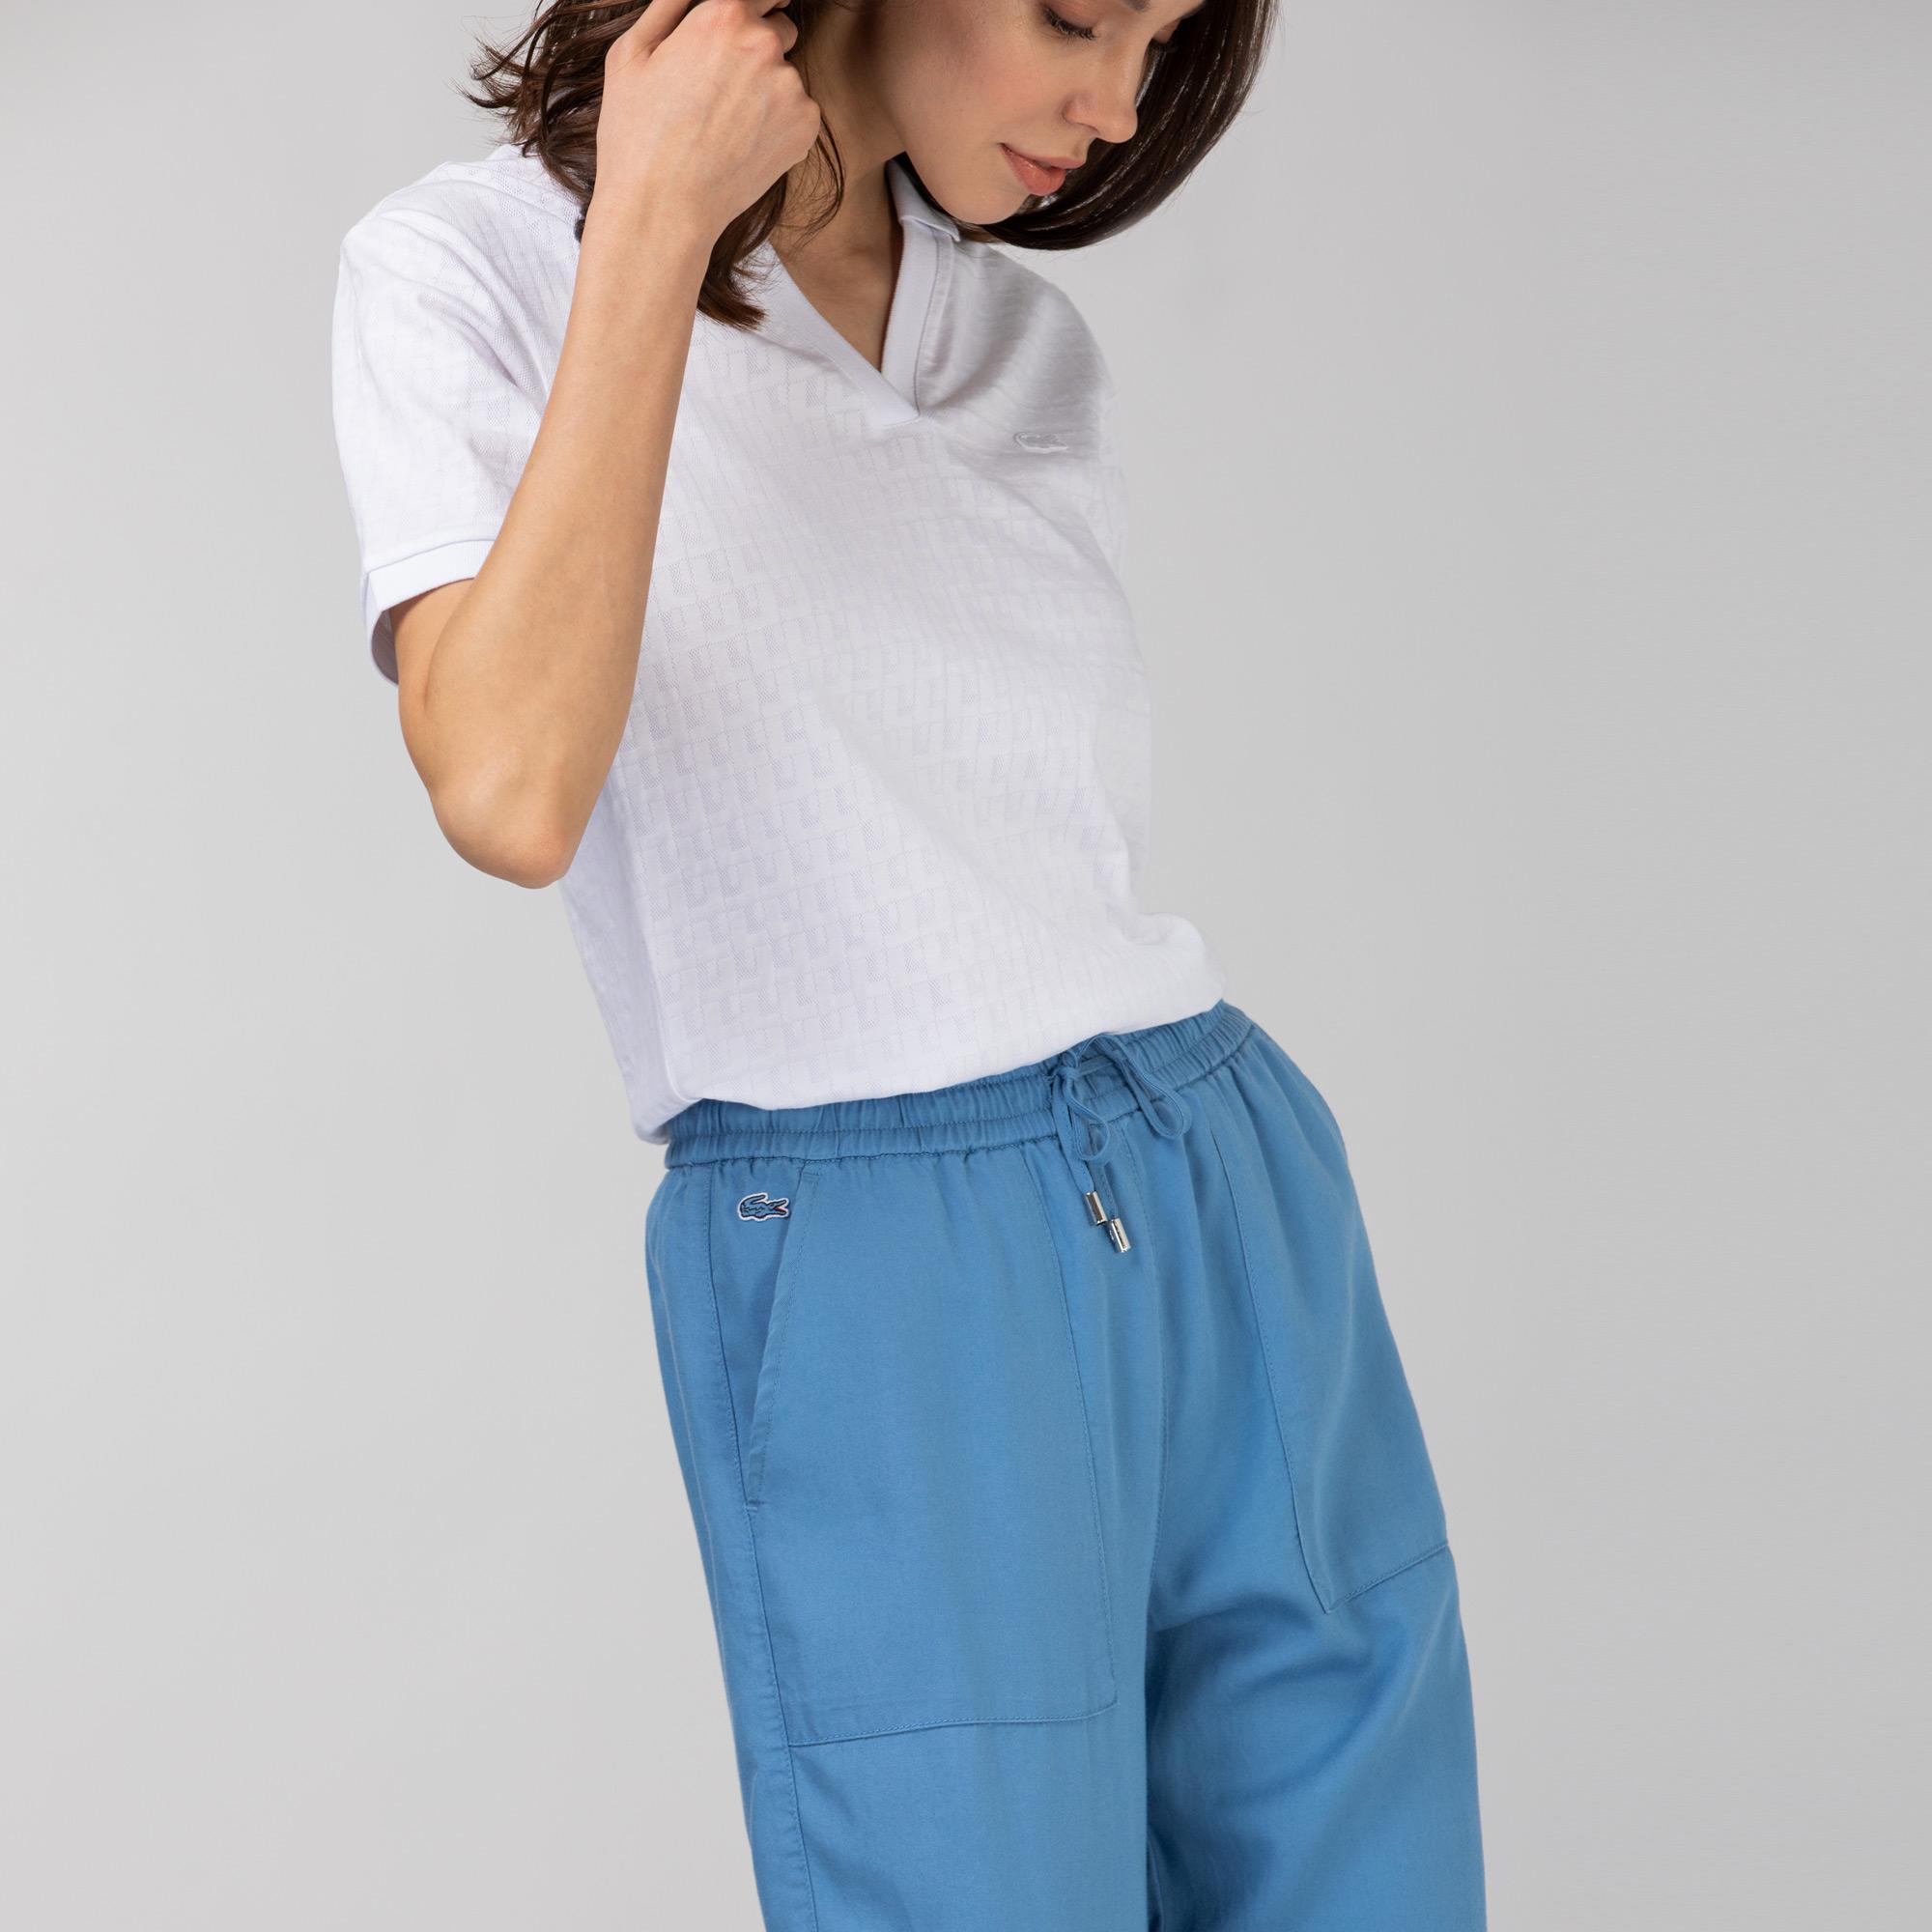 Lacoste Kadın Mavi Jogger Pantolon